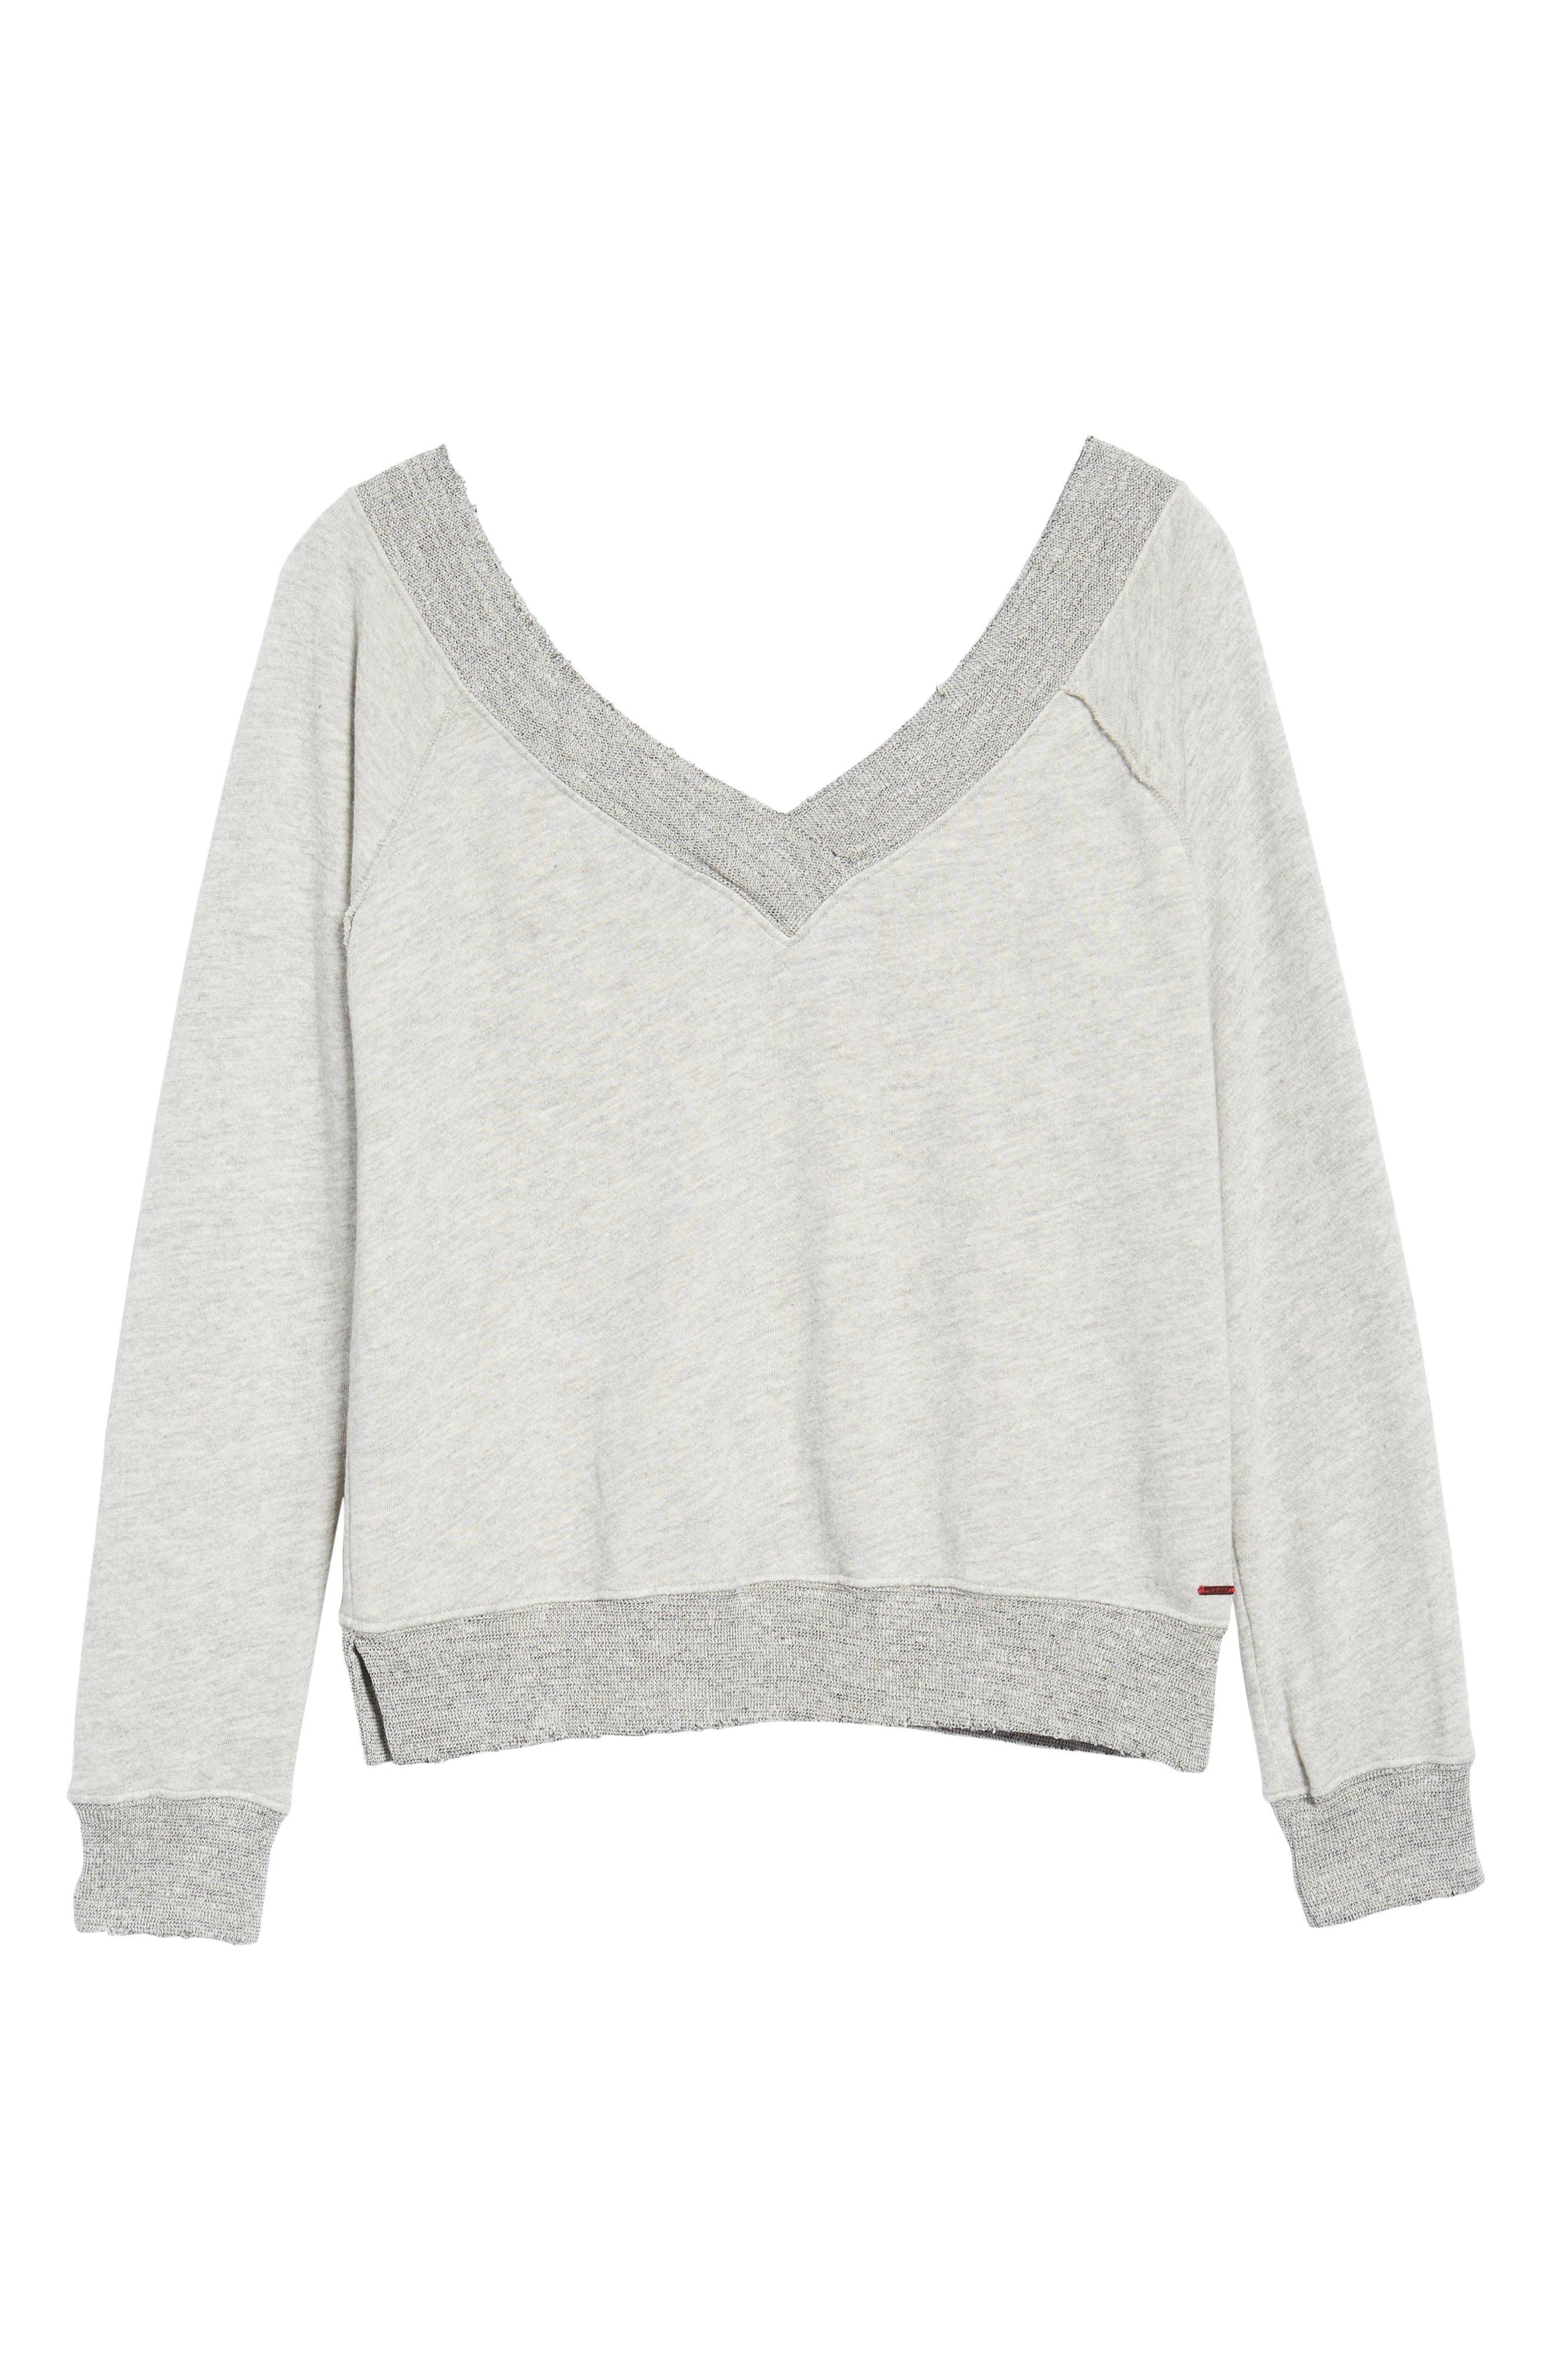 Mayer V-Neck Sweatshirt,                             Alternate thumbnail 6, color,                             Heather Grey